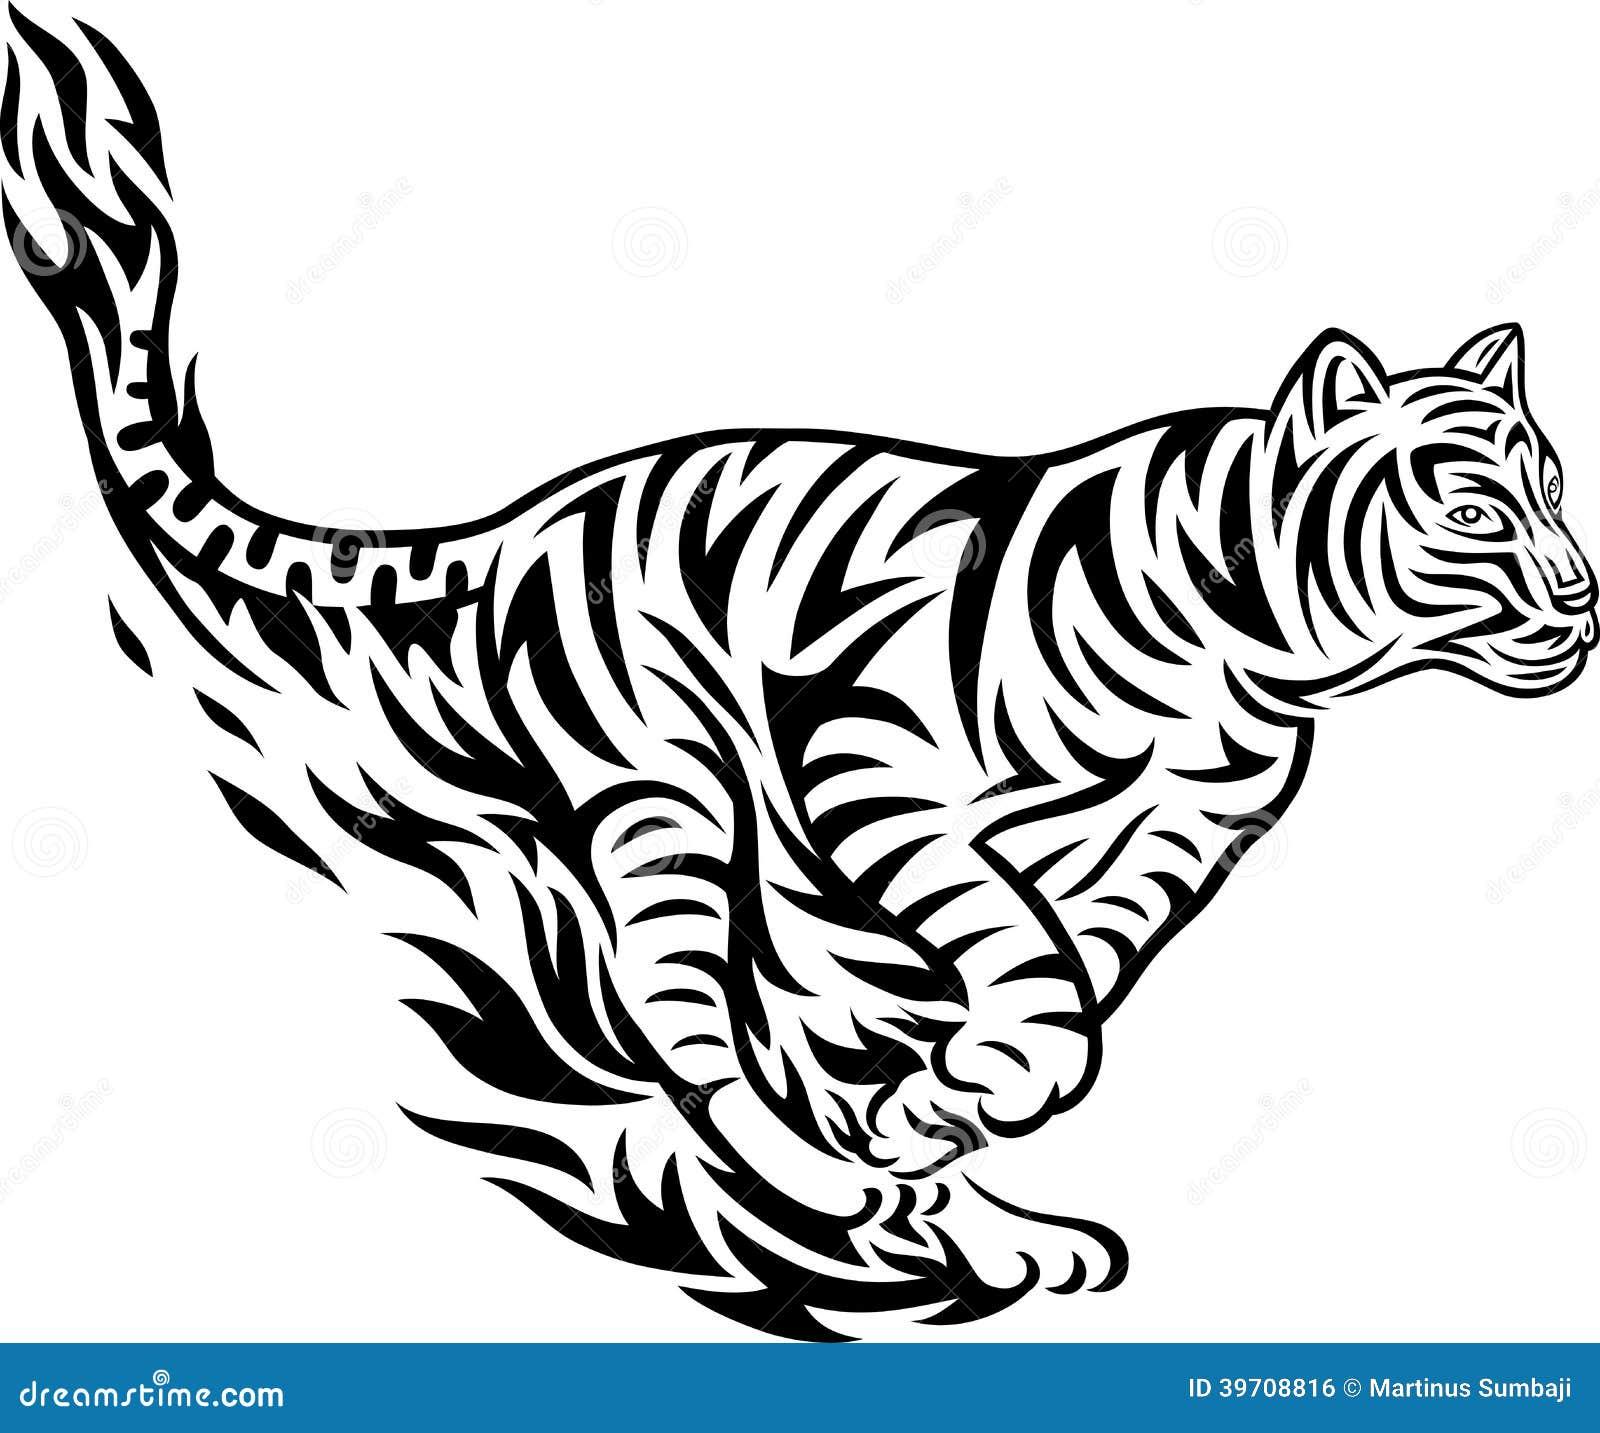 Tiger fair tribal stock vector. Illustration of creative ...